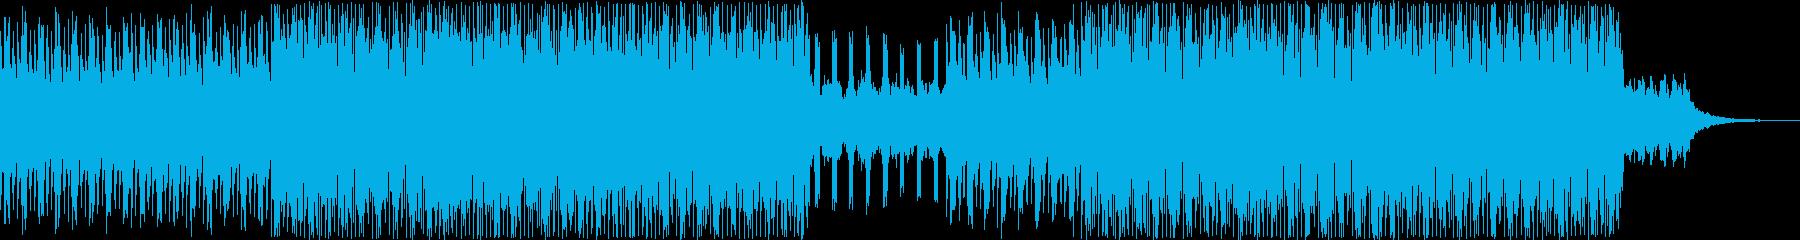 VPなどの映像用BGMに(MP3)の再生済みの波形